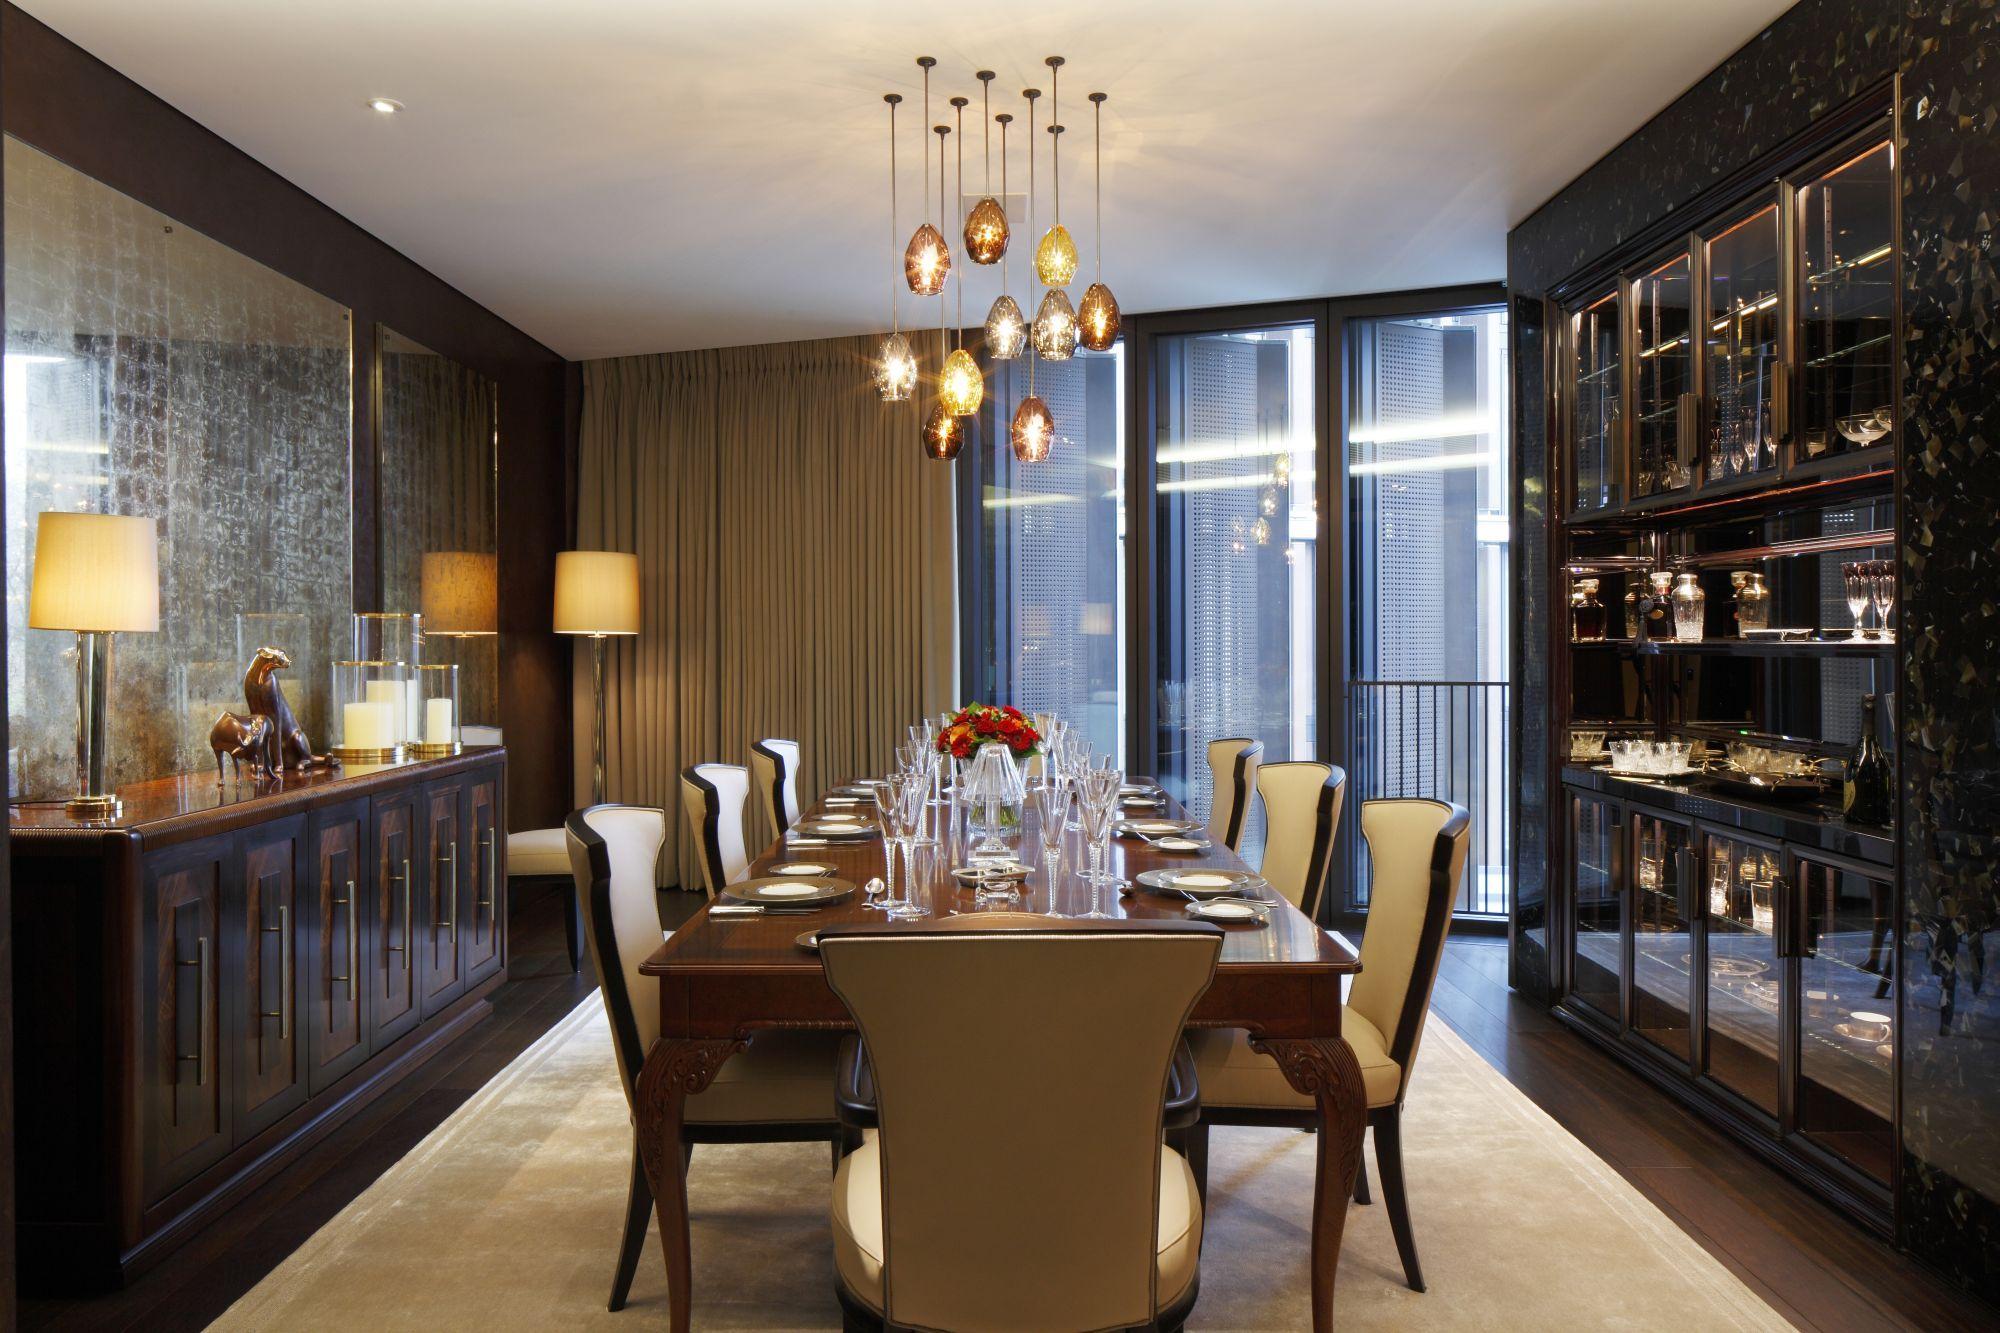 Dining Room Lighting In One Hyde Park Knightsbridge London Beautiful Dining Rooms Dream Dining Room Luxury Dining Room